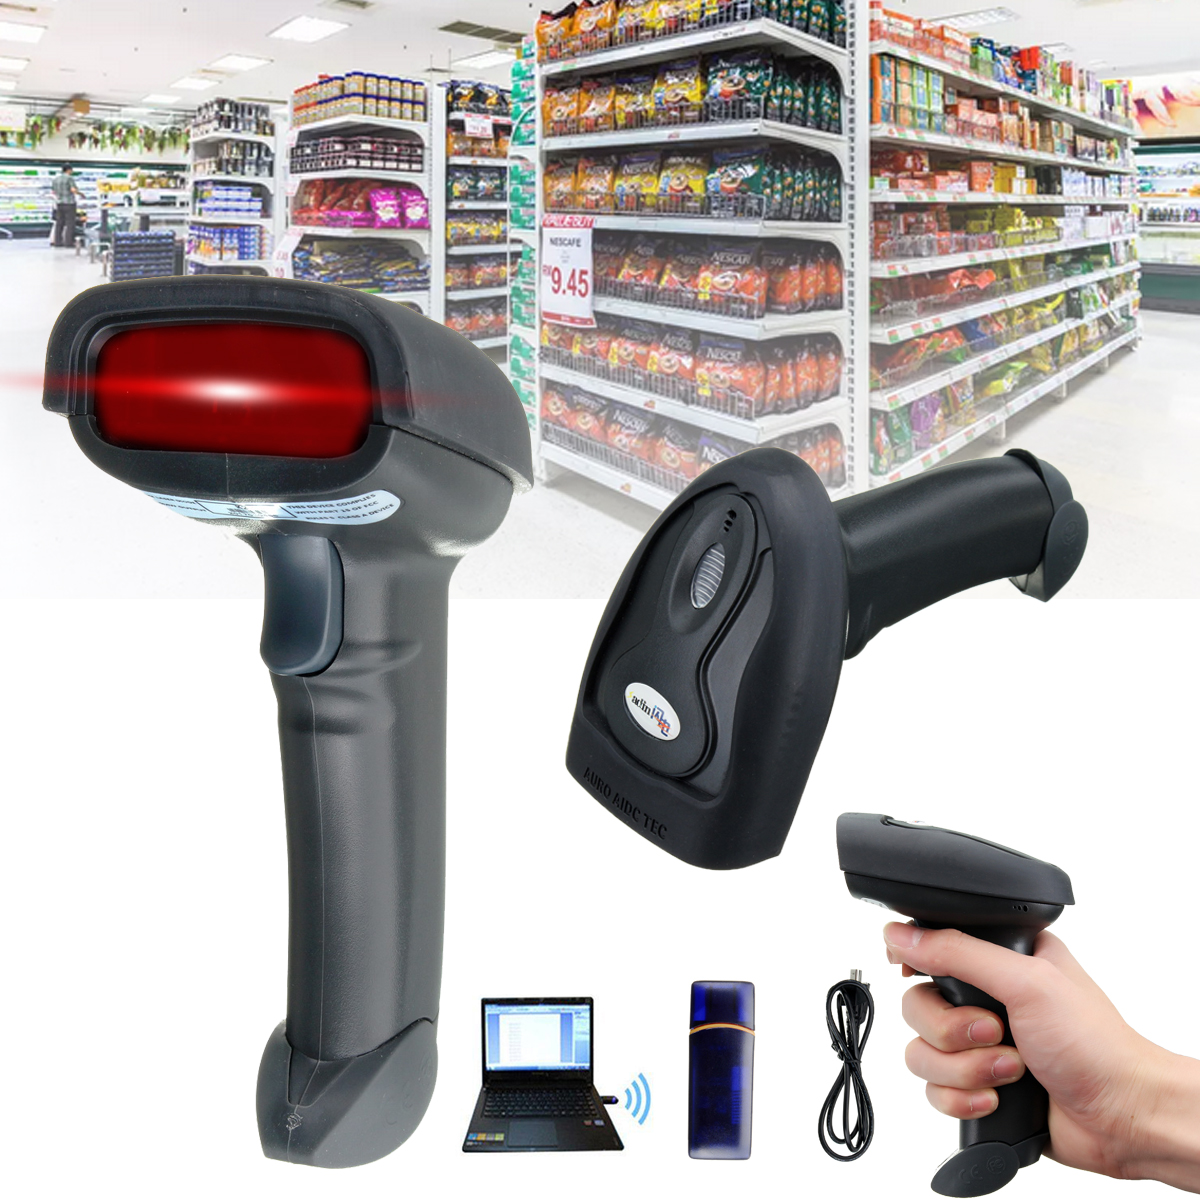 Wireless Scanner Wifi Laser Handheld Scanner Barcode 2.4G USB POS Scan Bar Code Scanner Reader Scan Gun for Supermarkets new handheld bluetooth wireless usb automatic barcode scanner reader with usb receiver for pos pc laptop em88